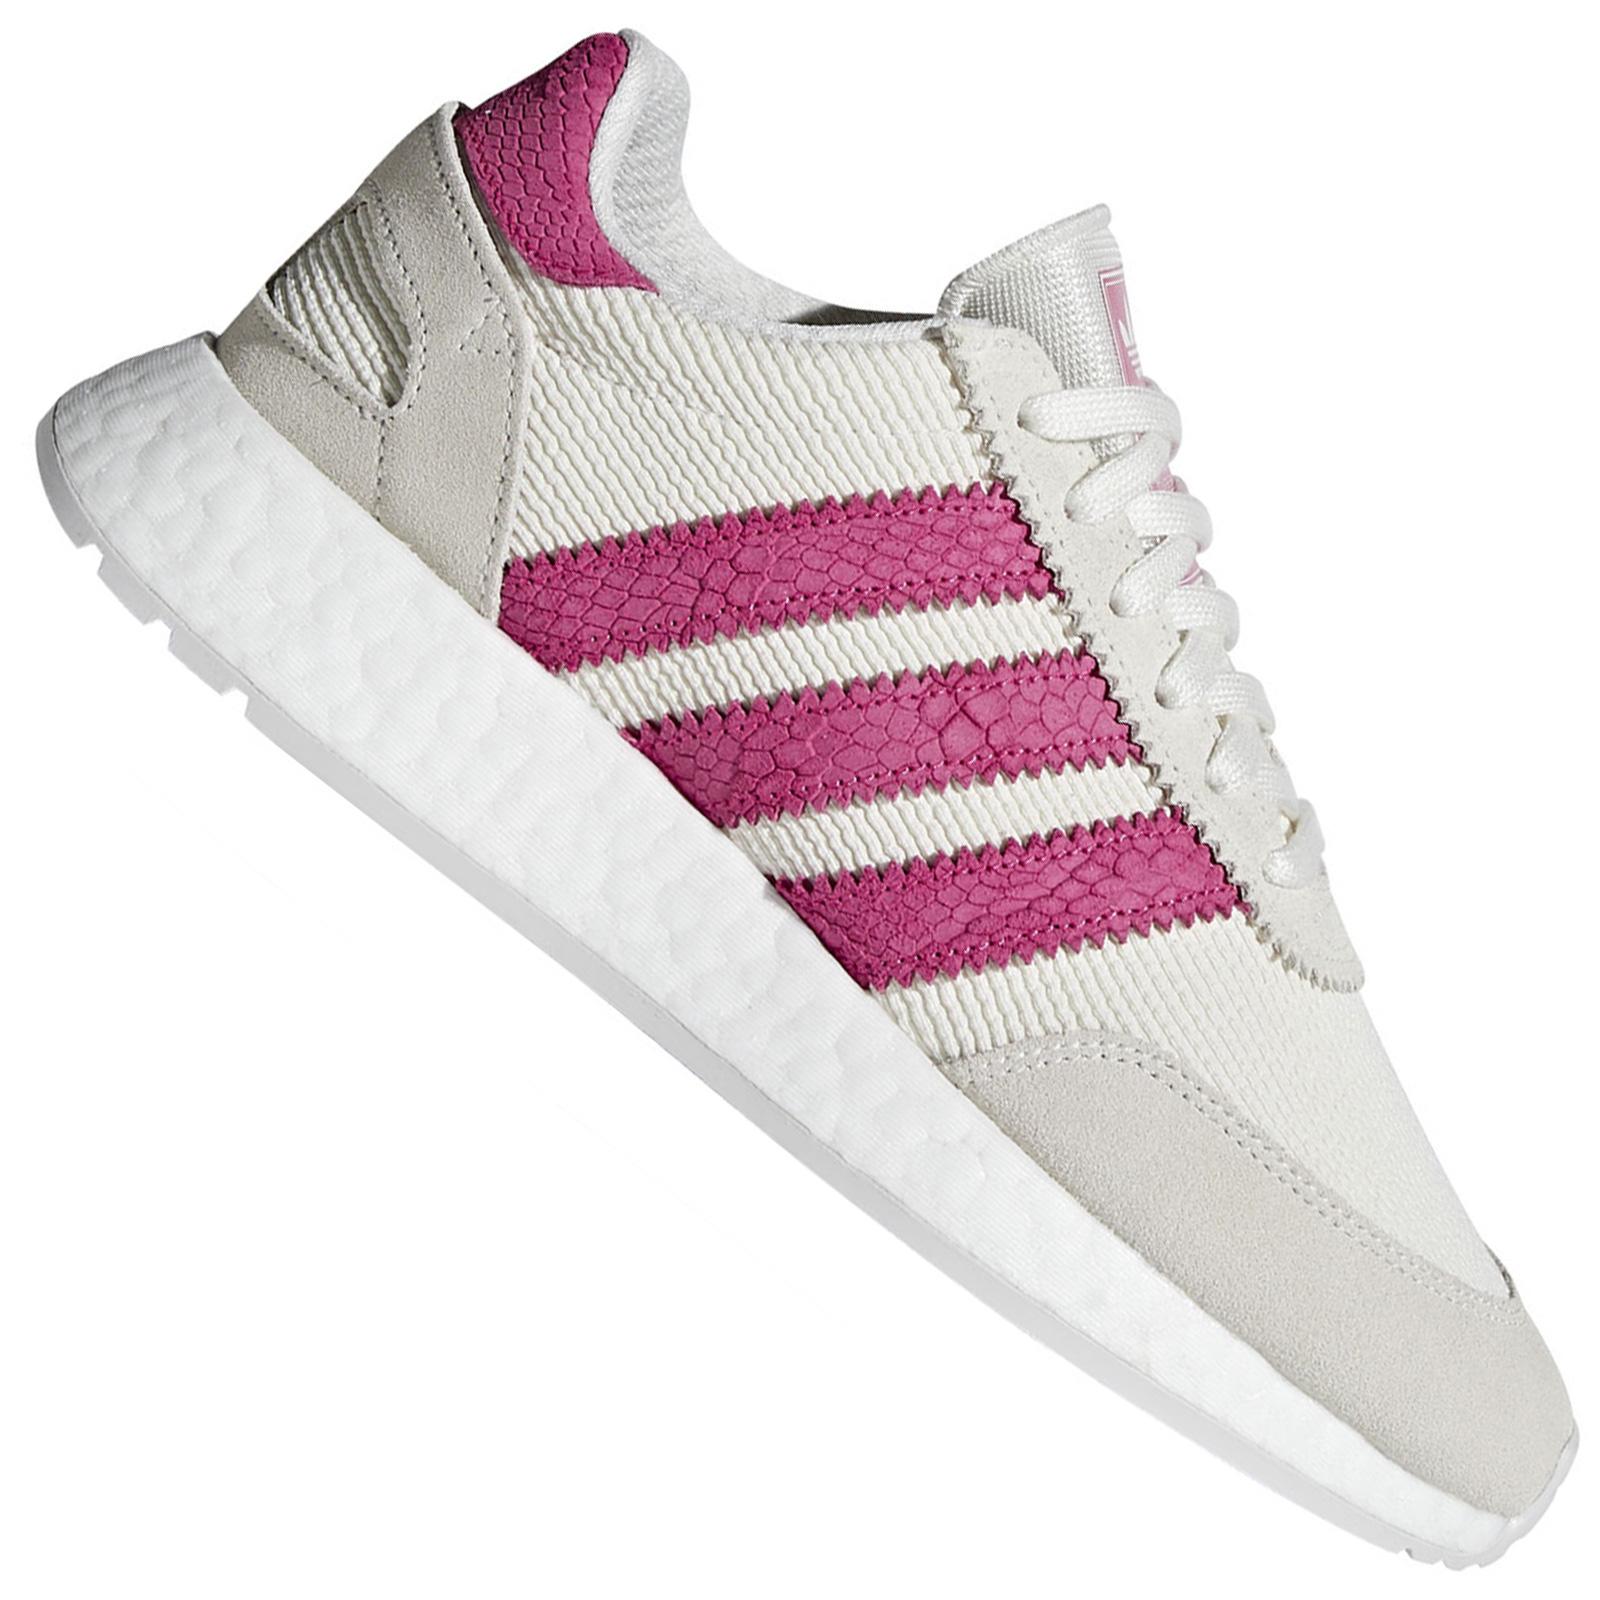 adidas Damen Iniki Runner I 5923 Sneaker Turnschuhe Sportschuhe Weiß Shock Pink